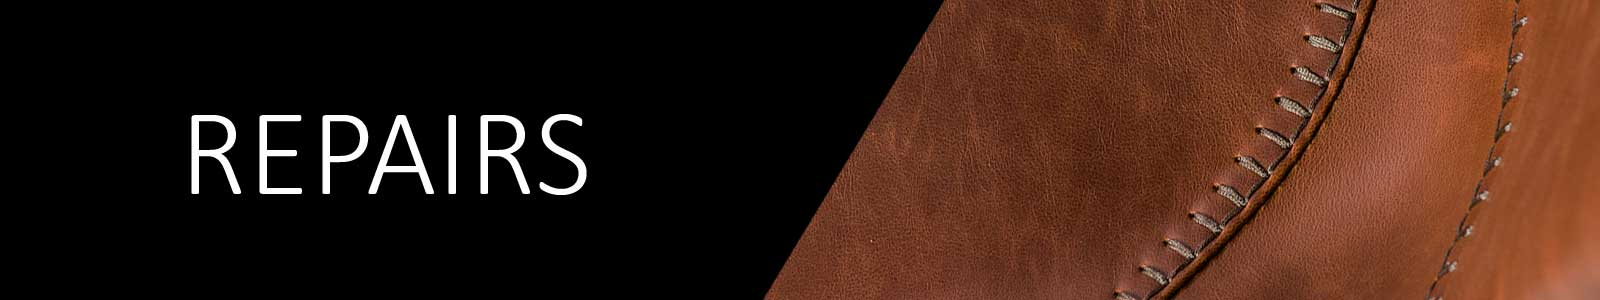 Repairing Leather